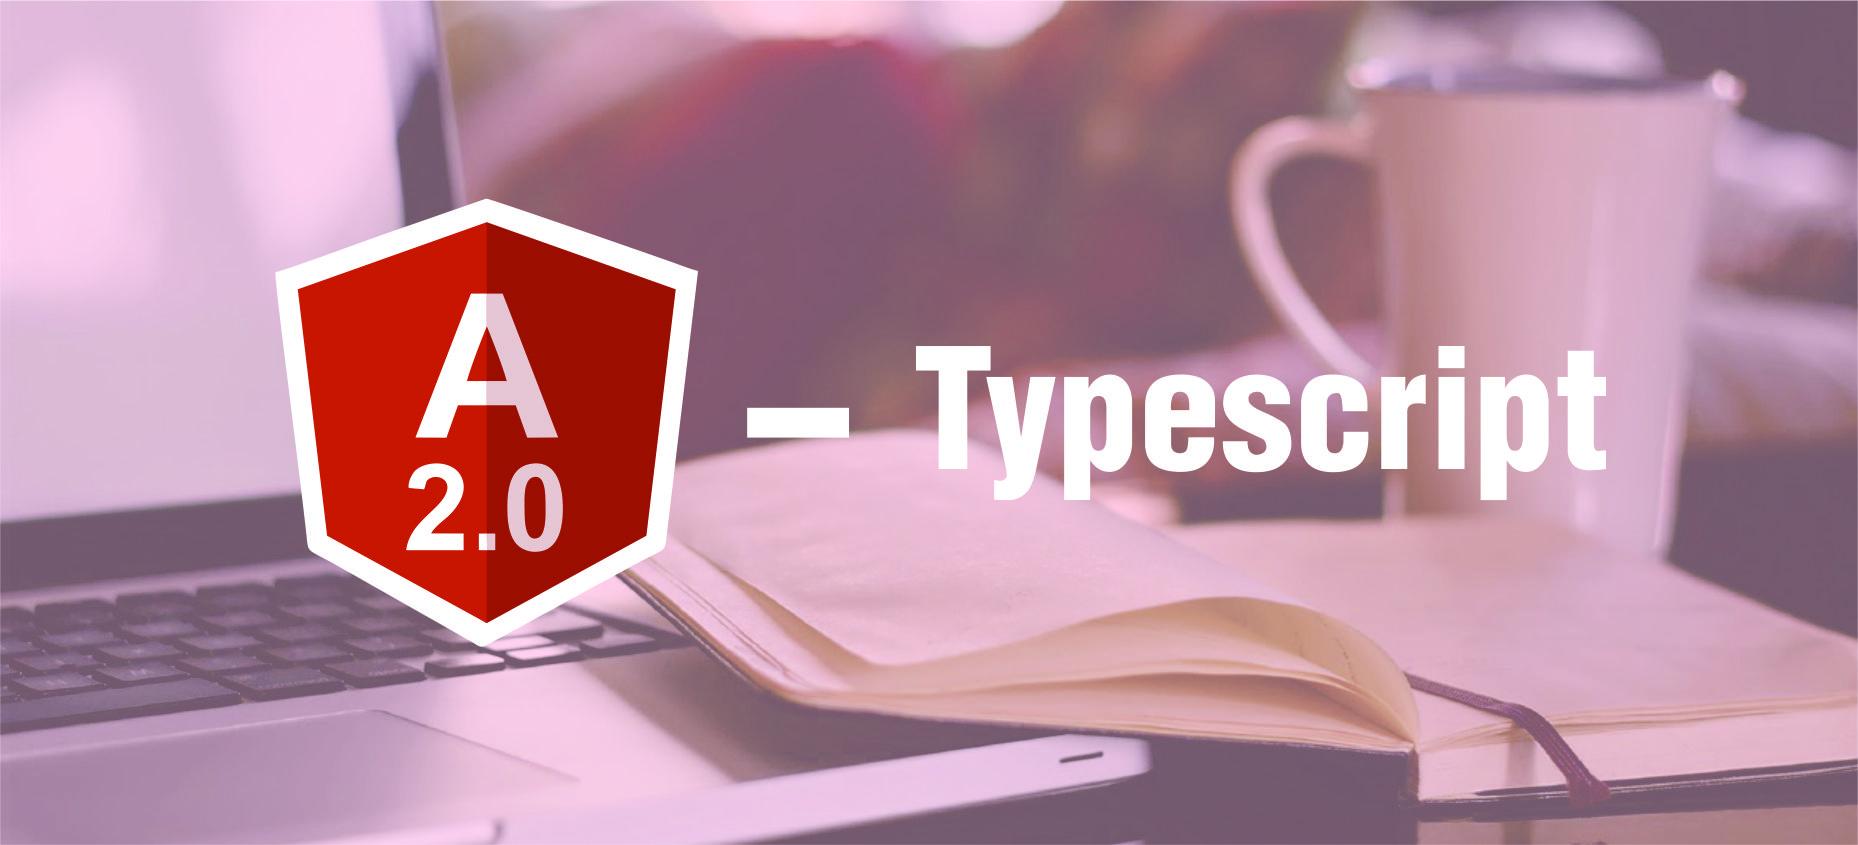 Angular2- Typescript